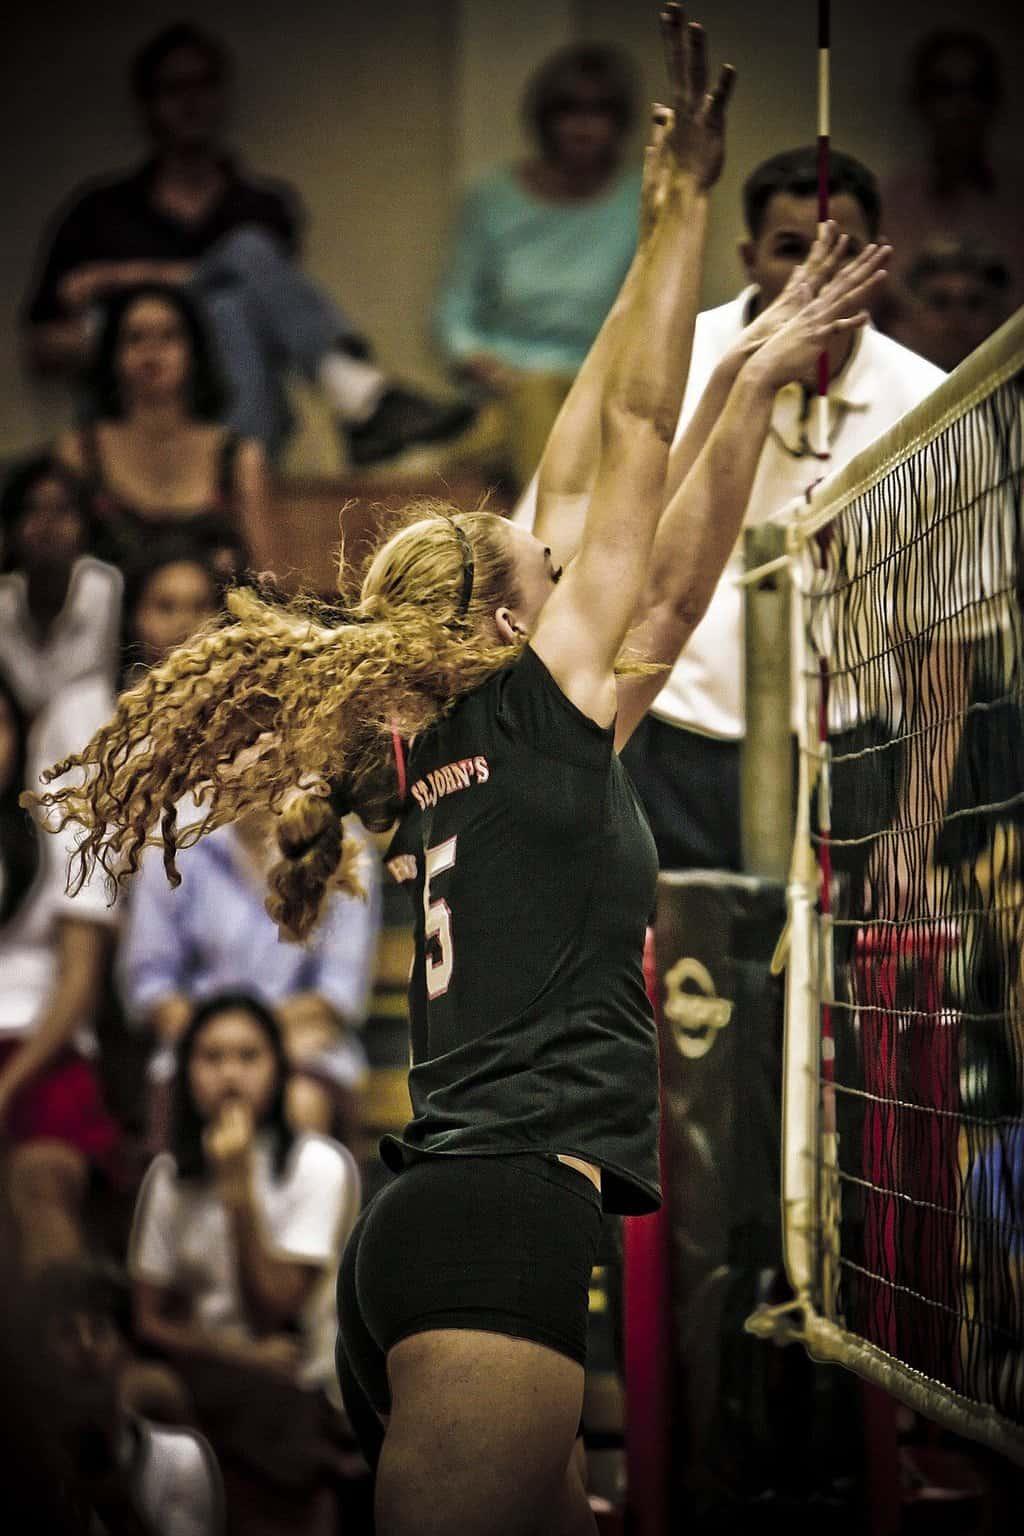 Women volleyball players blocking near the net